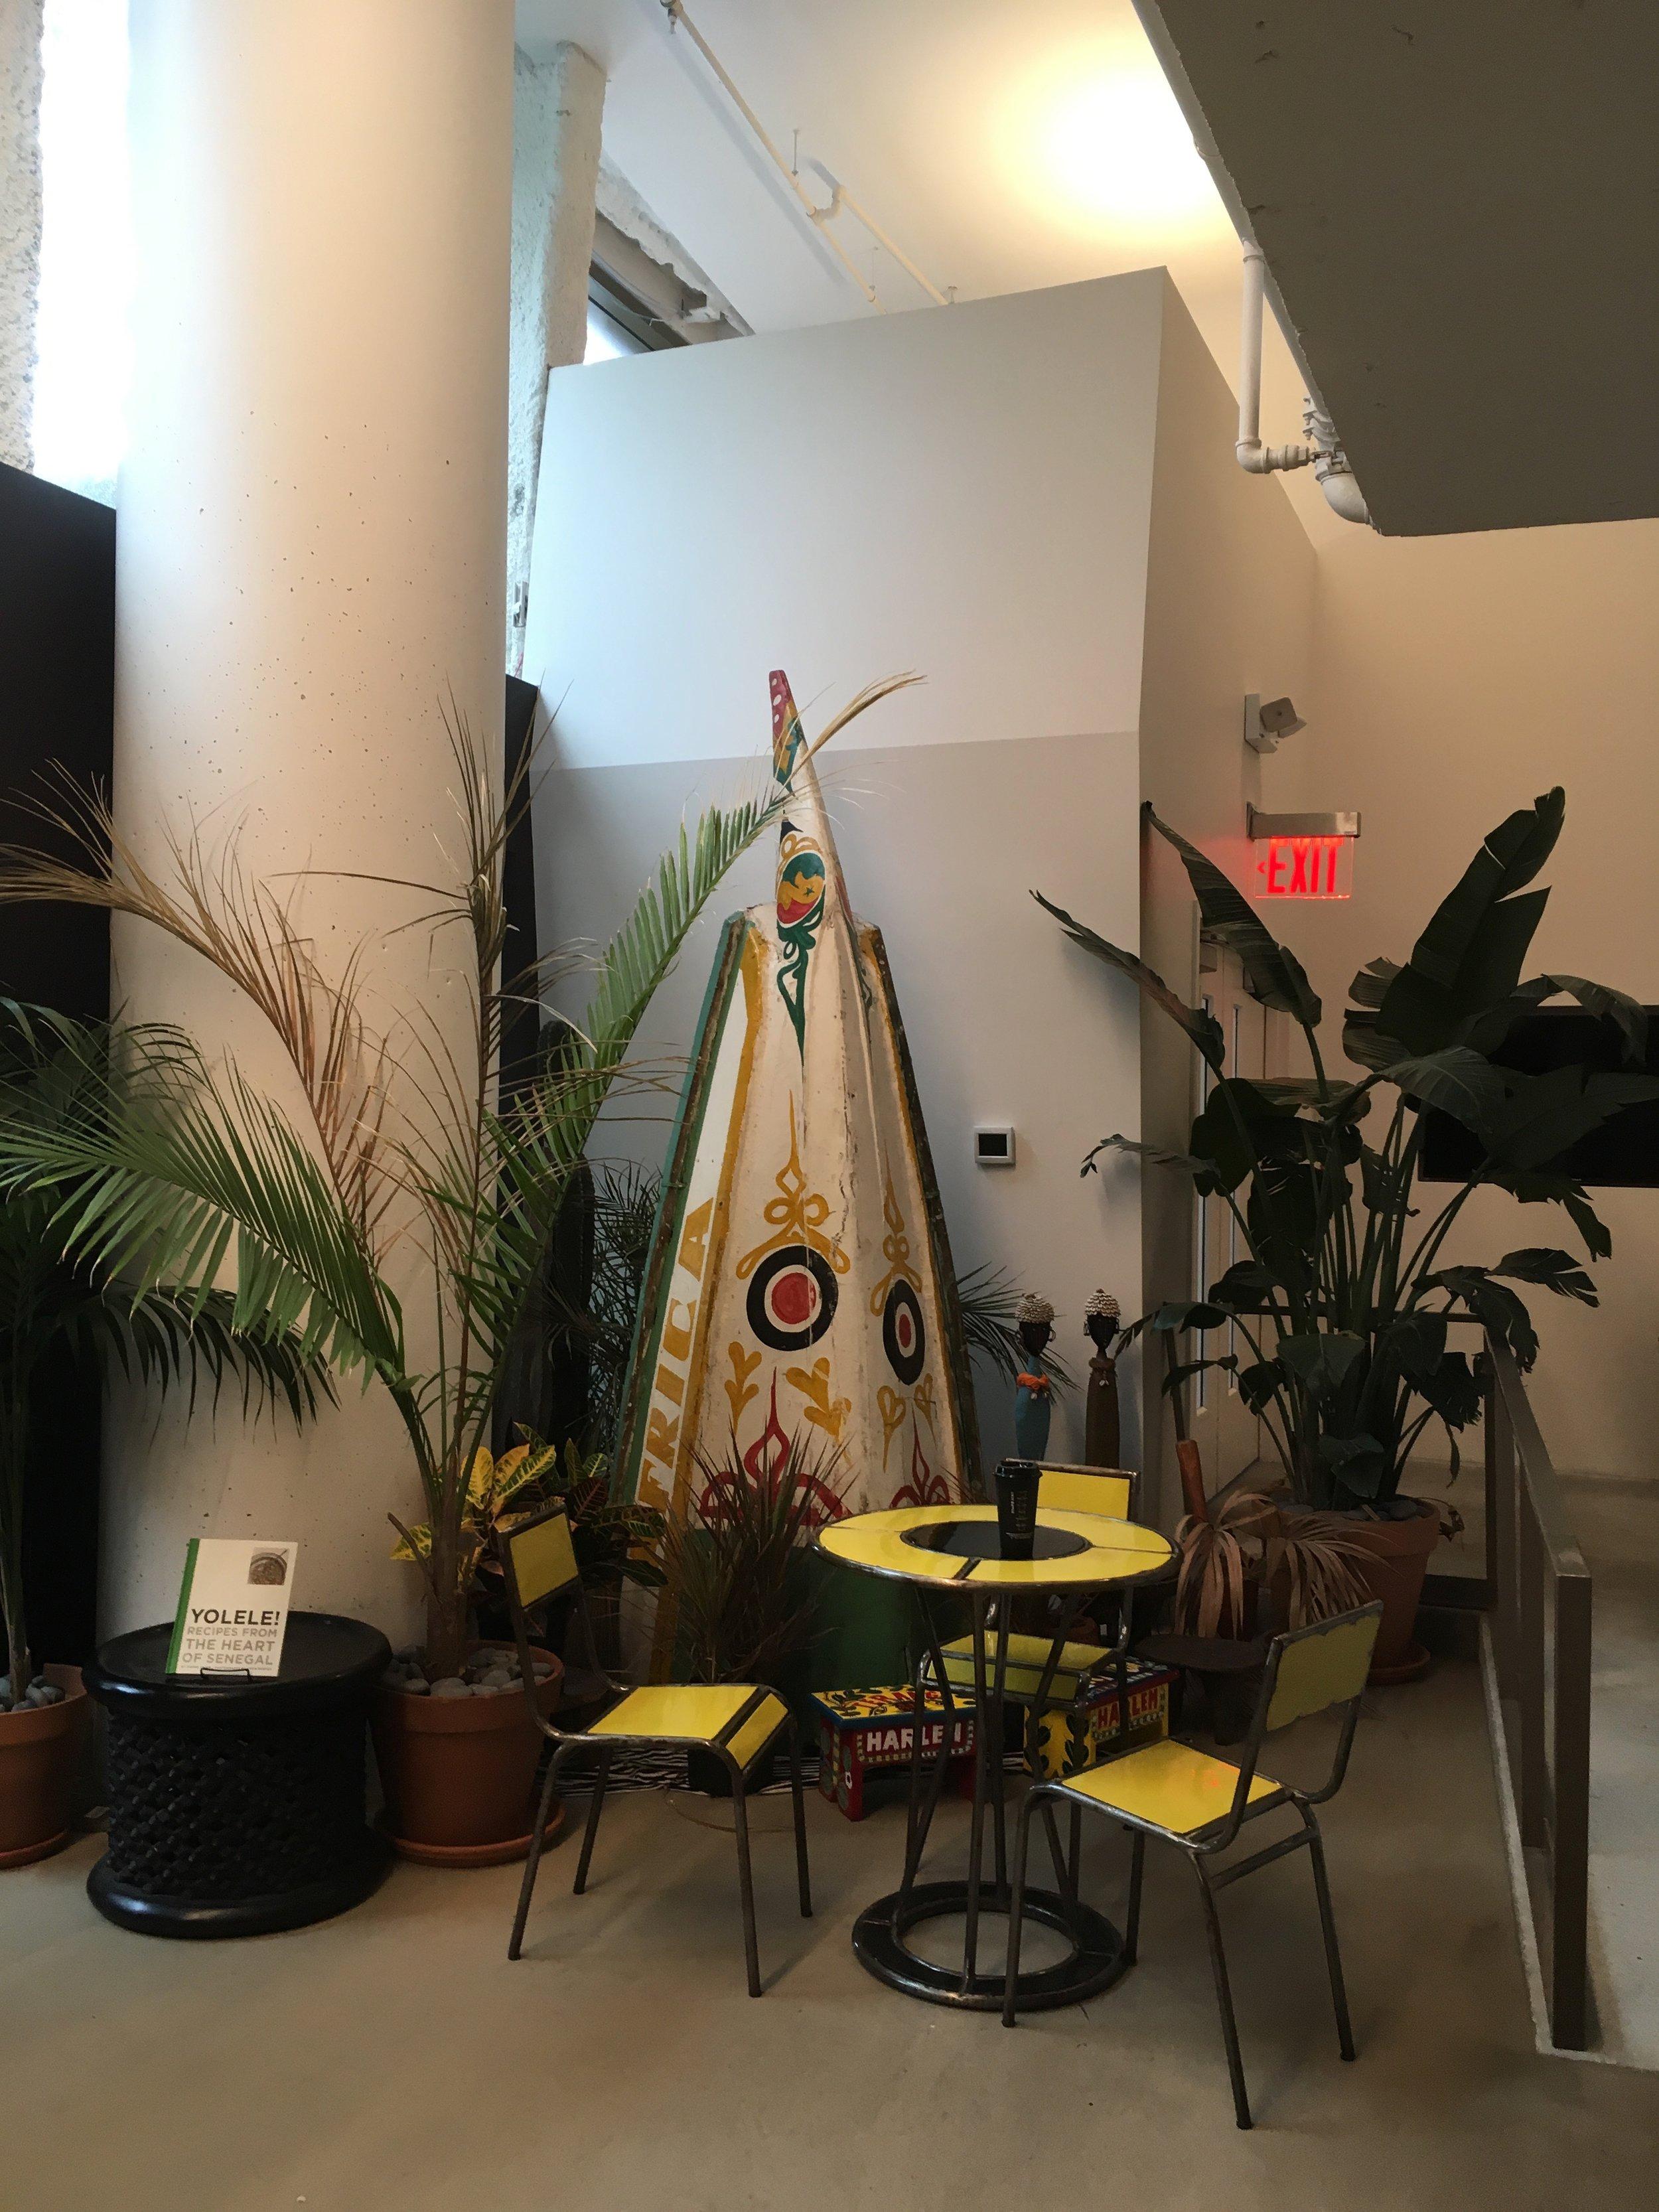 Imaginative seating and lush flora